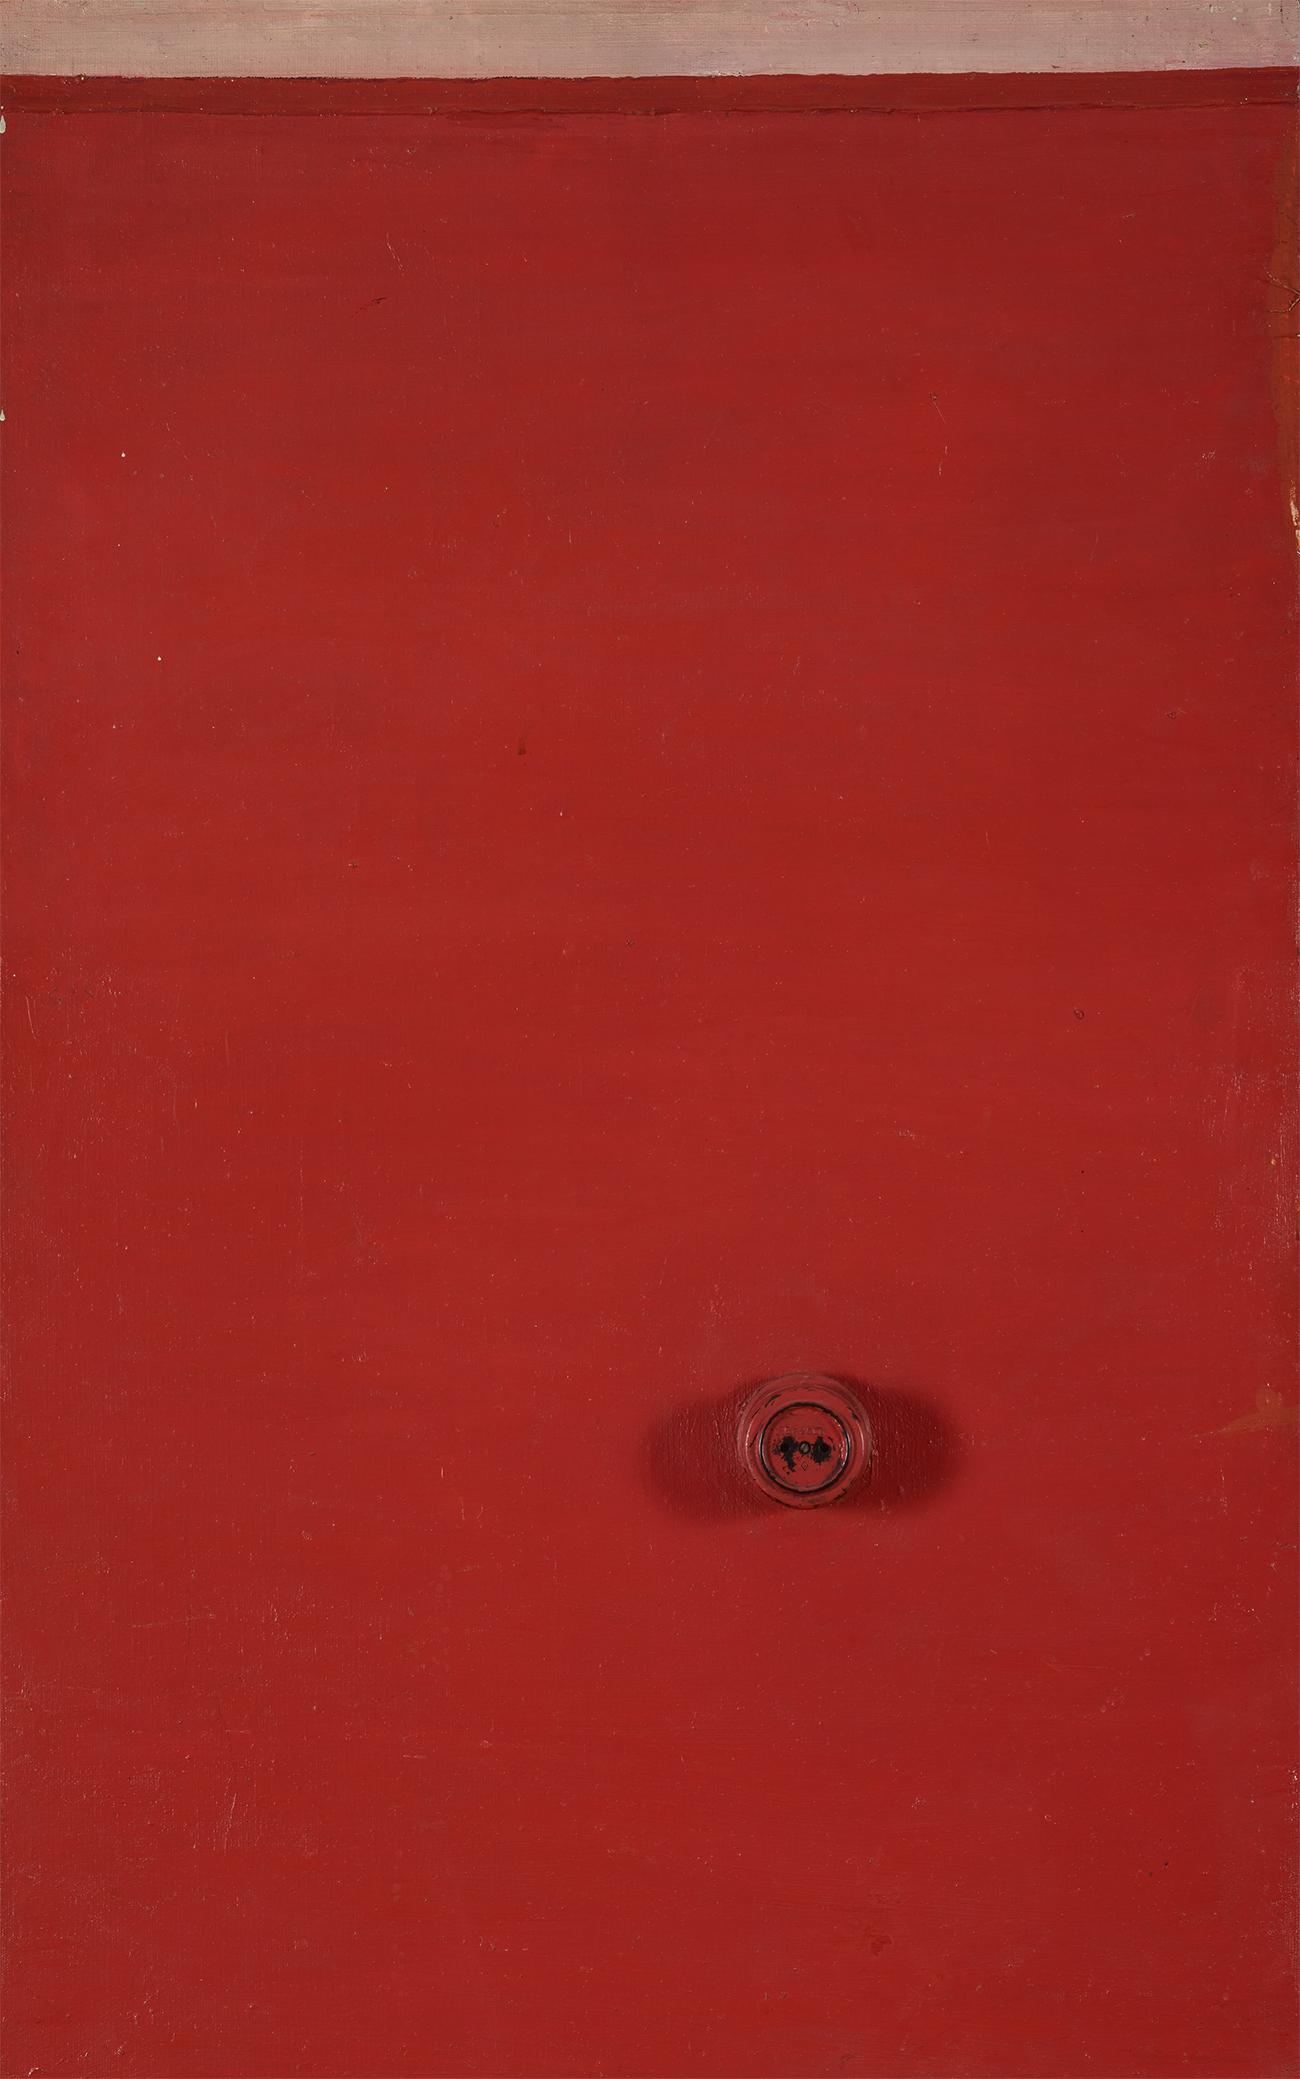 Mikhail Roginsky. Wall with socket. 1965 / State Tretyakov Gallery